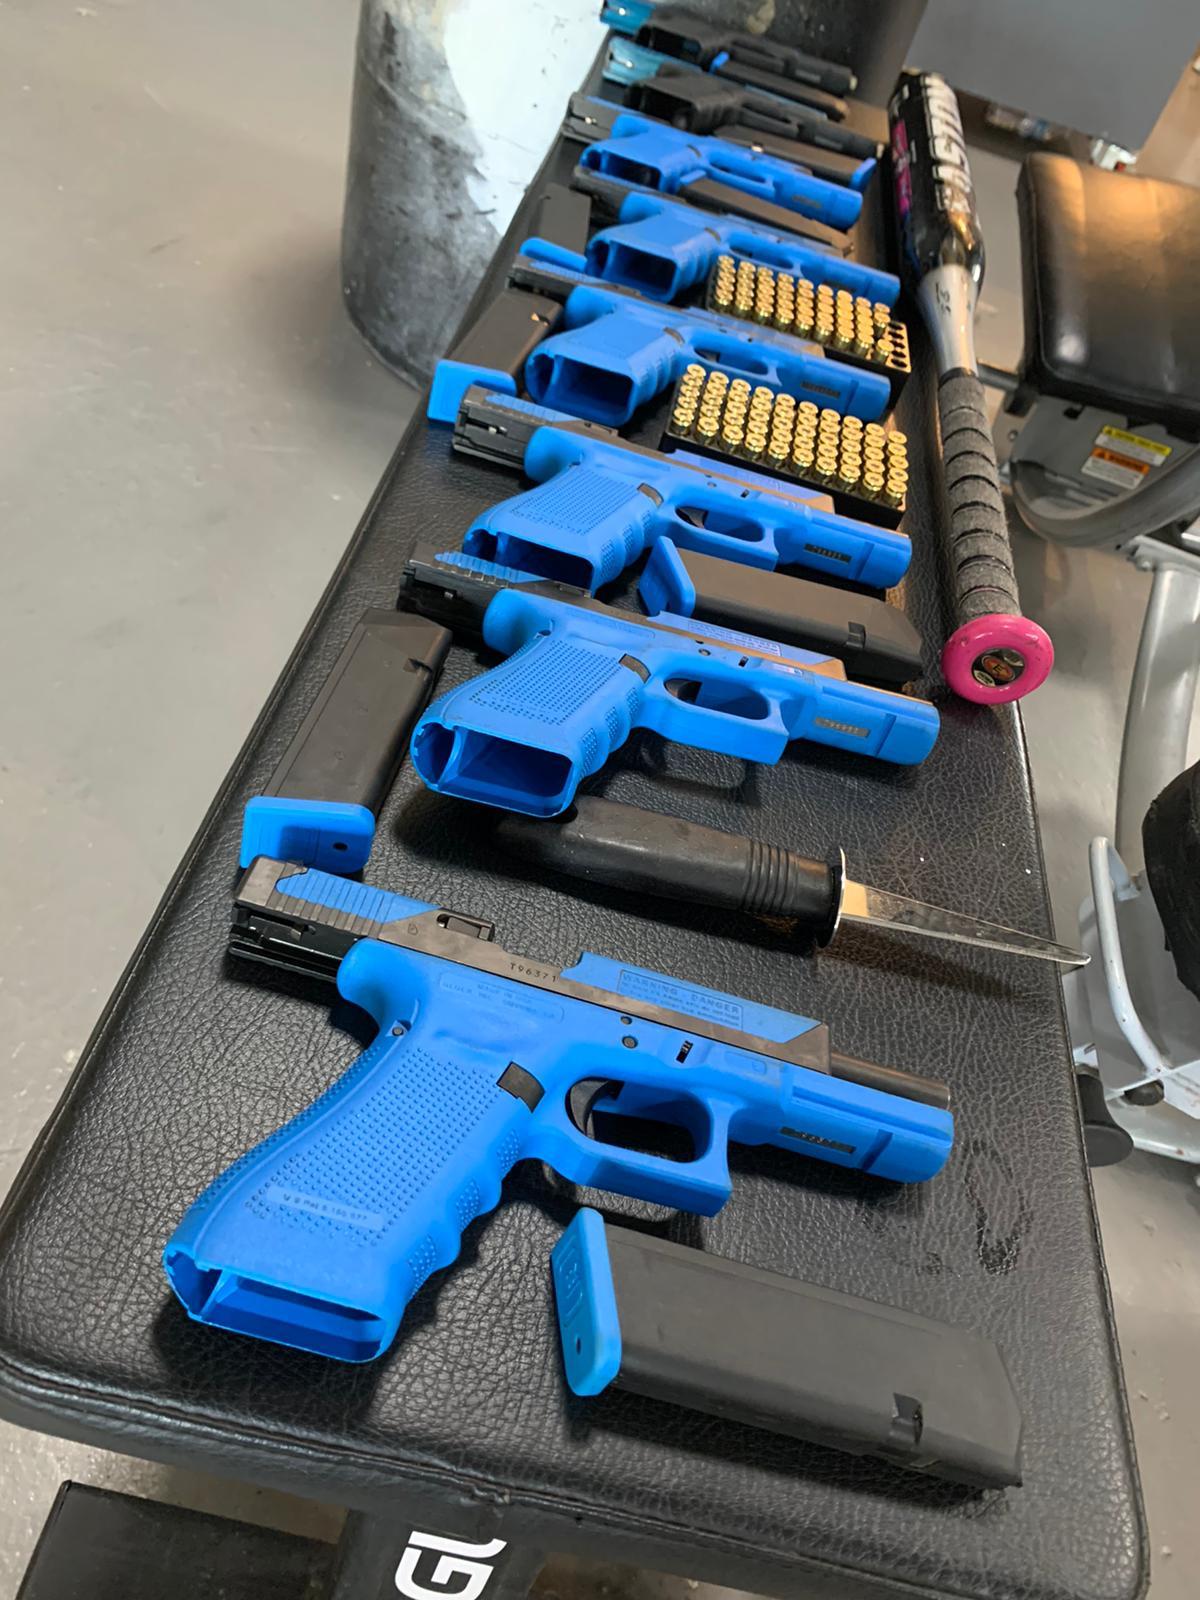 Miami Tactical close combat defense shooting Tactopsusa